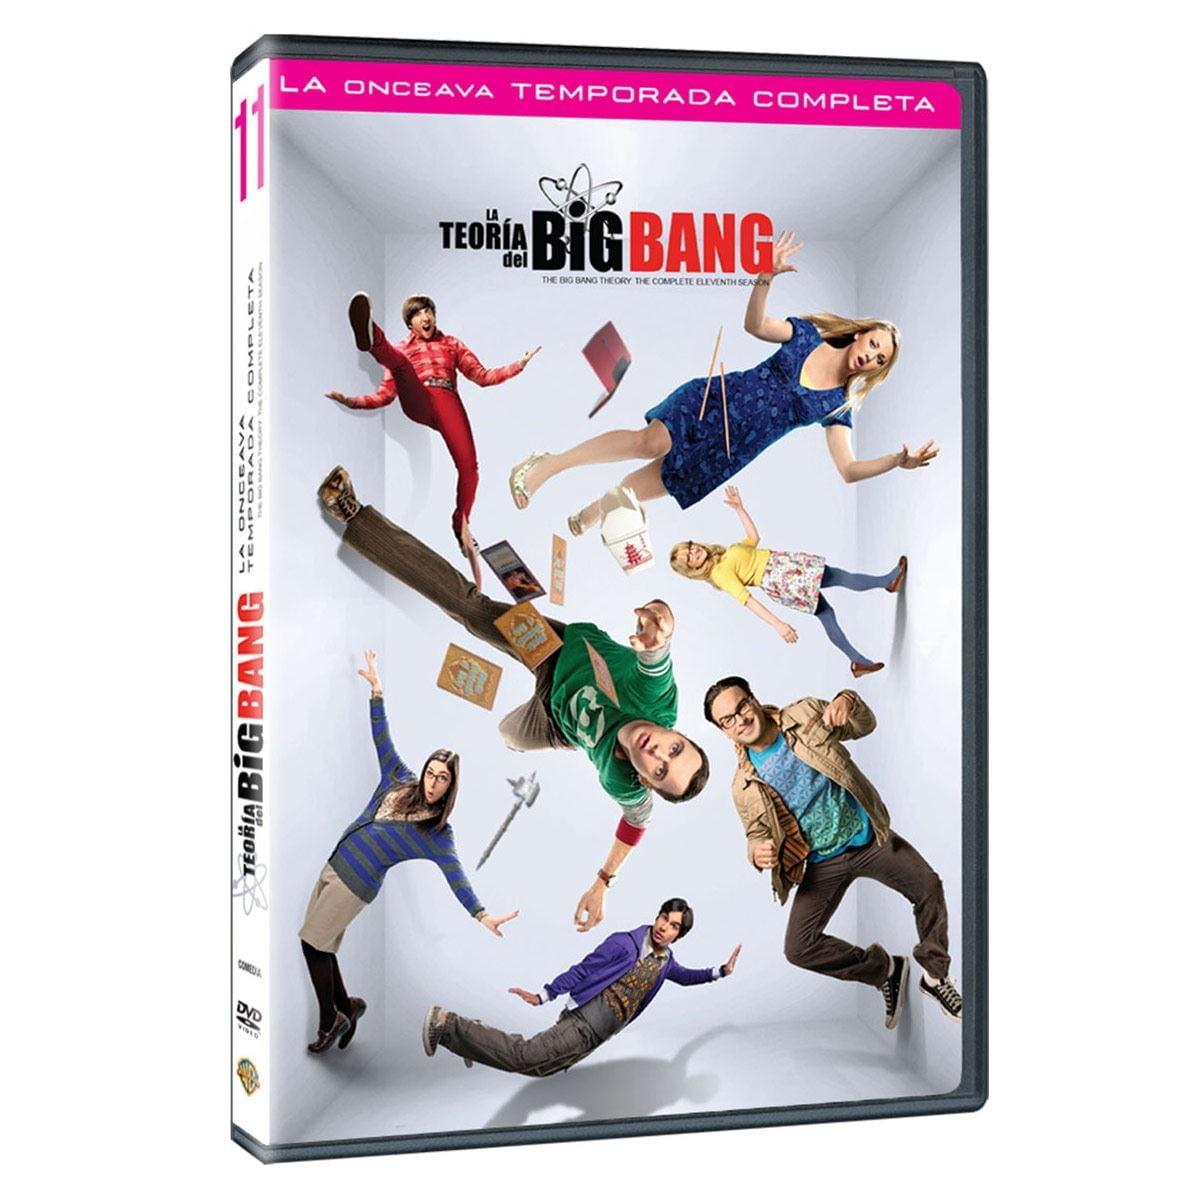 DVD The Big Bang Theory: Onceava Temporada Completa